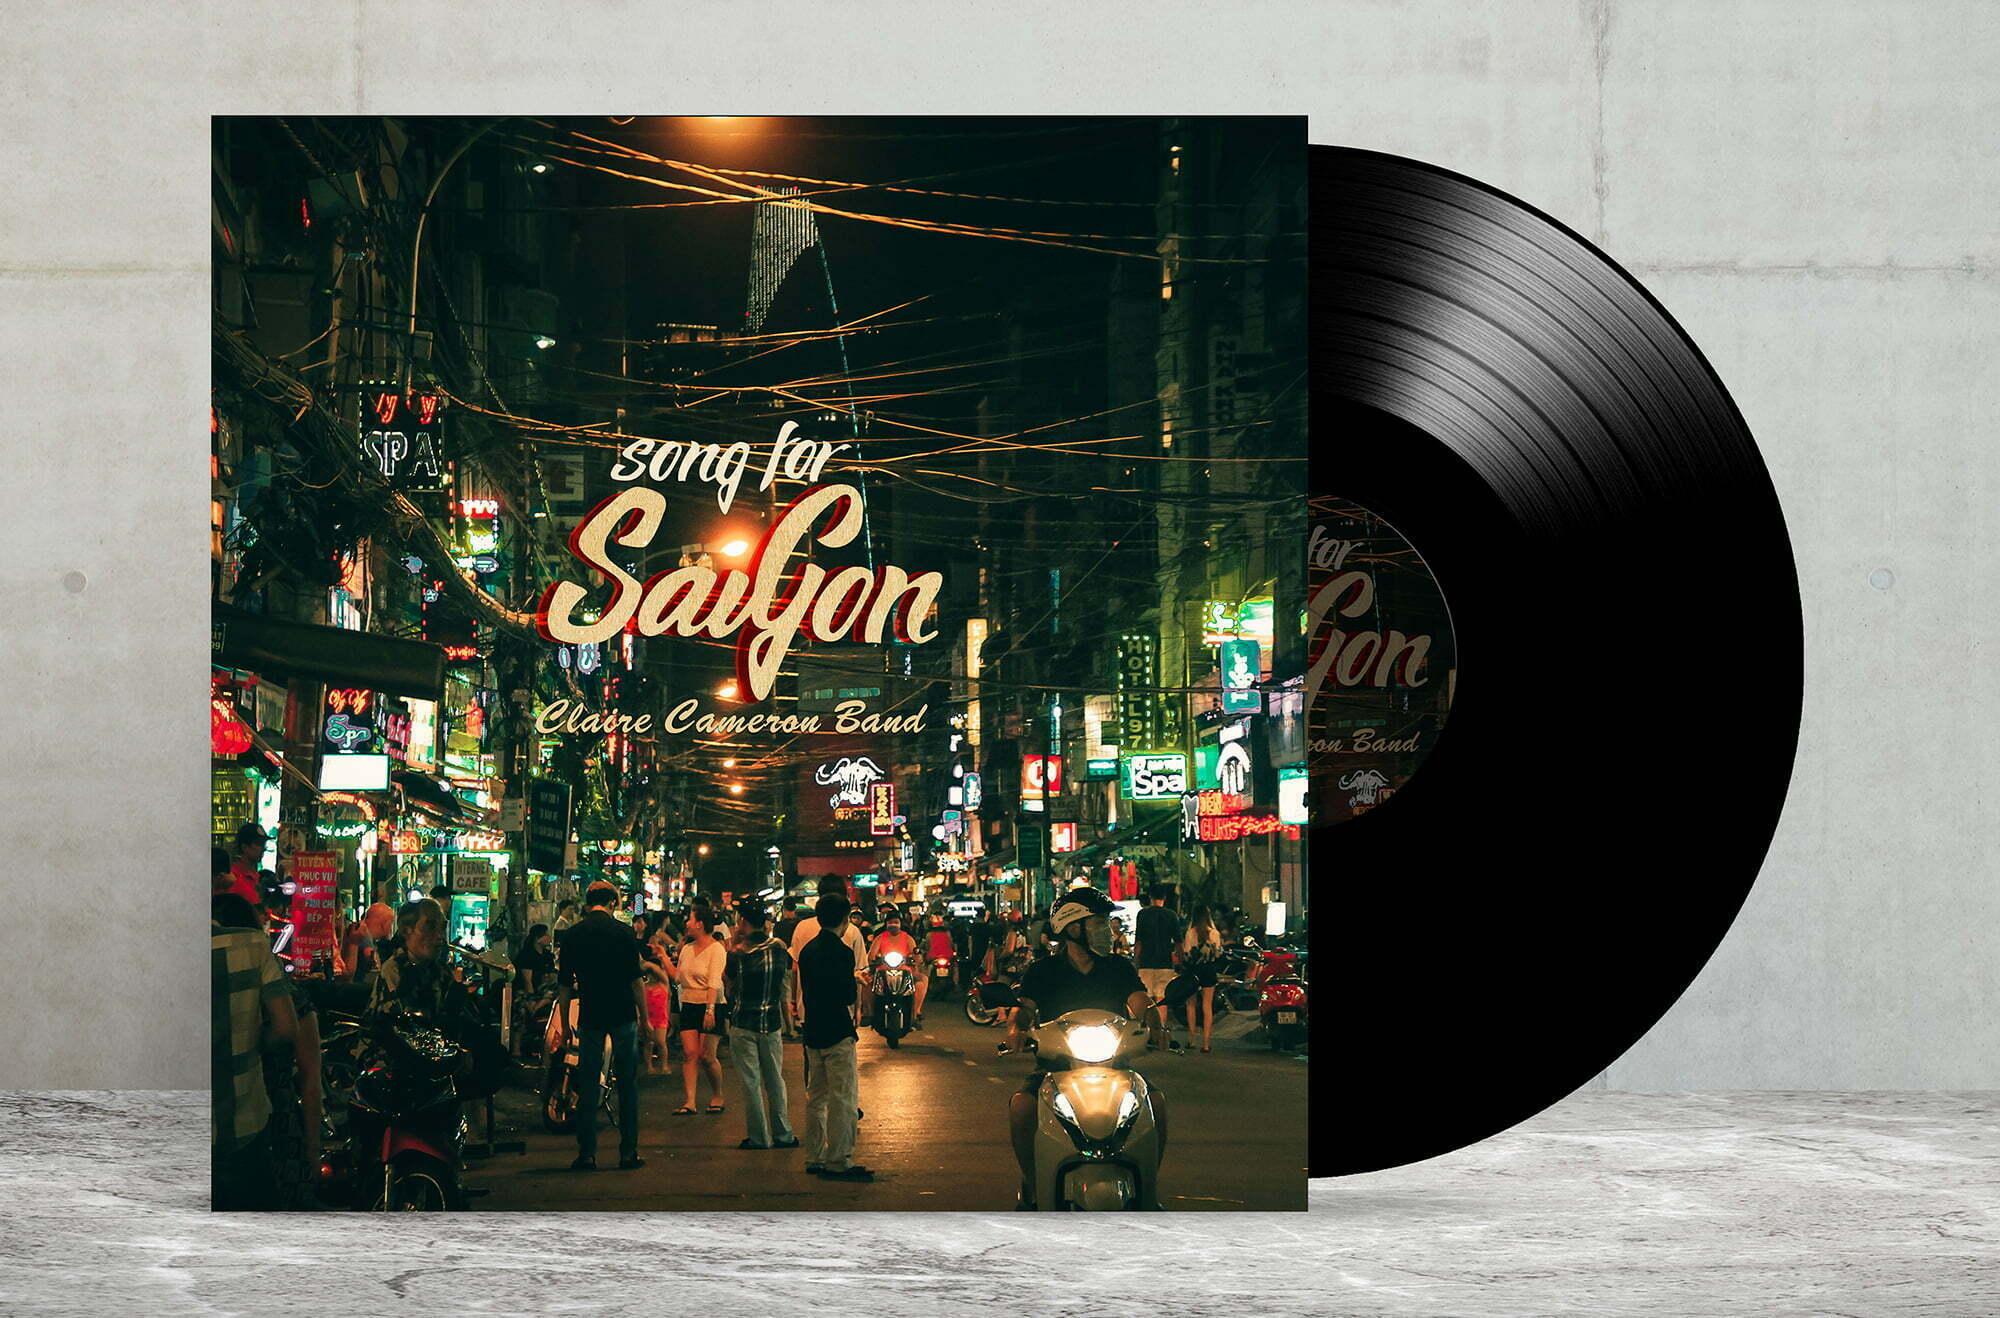 Song for Saigon